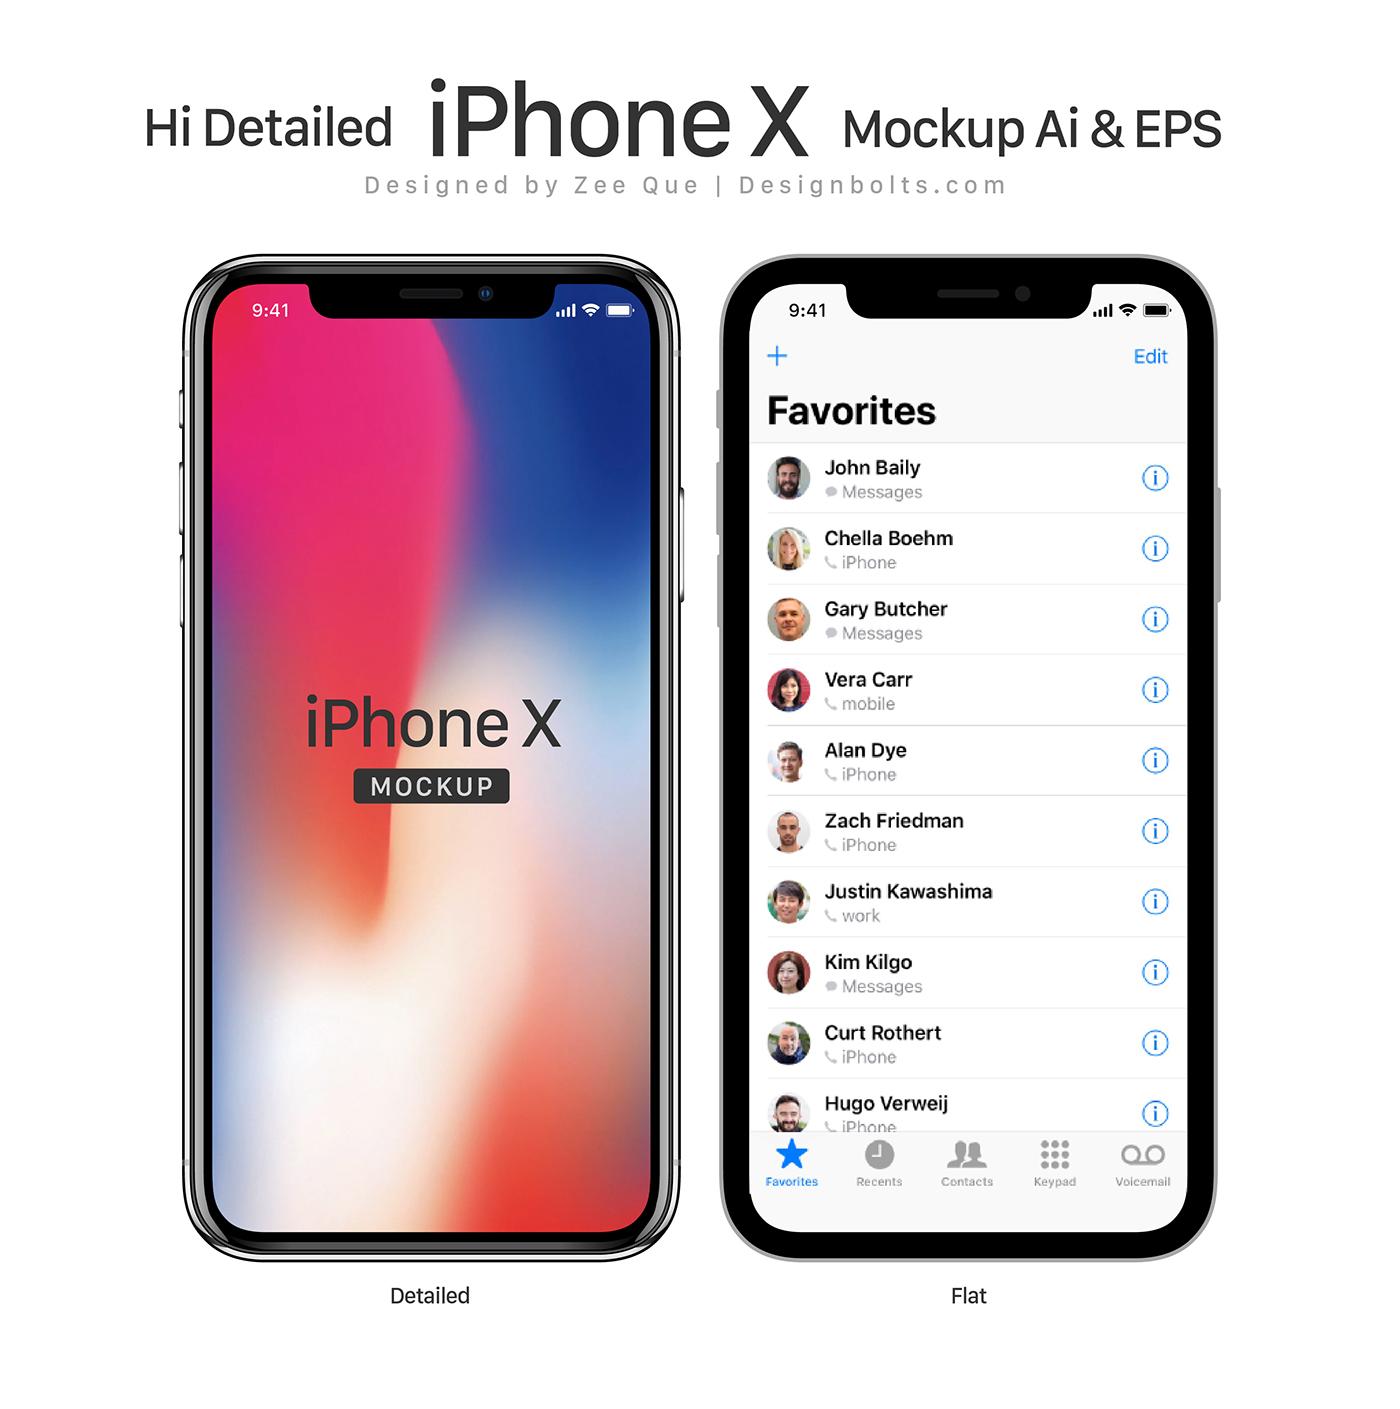 iPhone x apple iphone x iphone x mockup iphone mockup free mockup  mockup psd psd mockup freebie